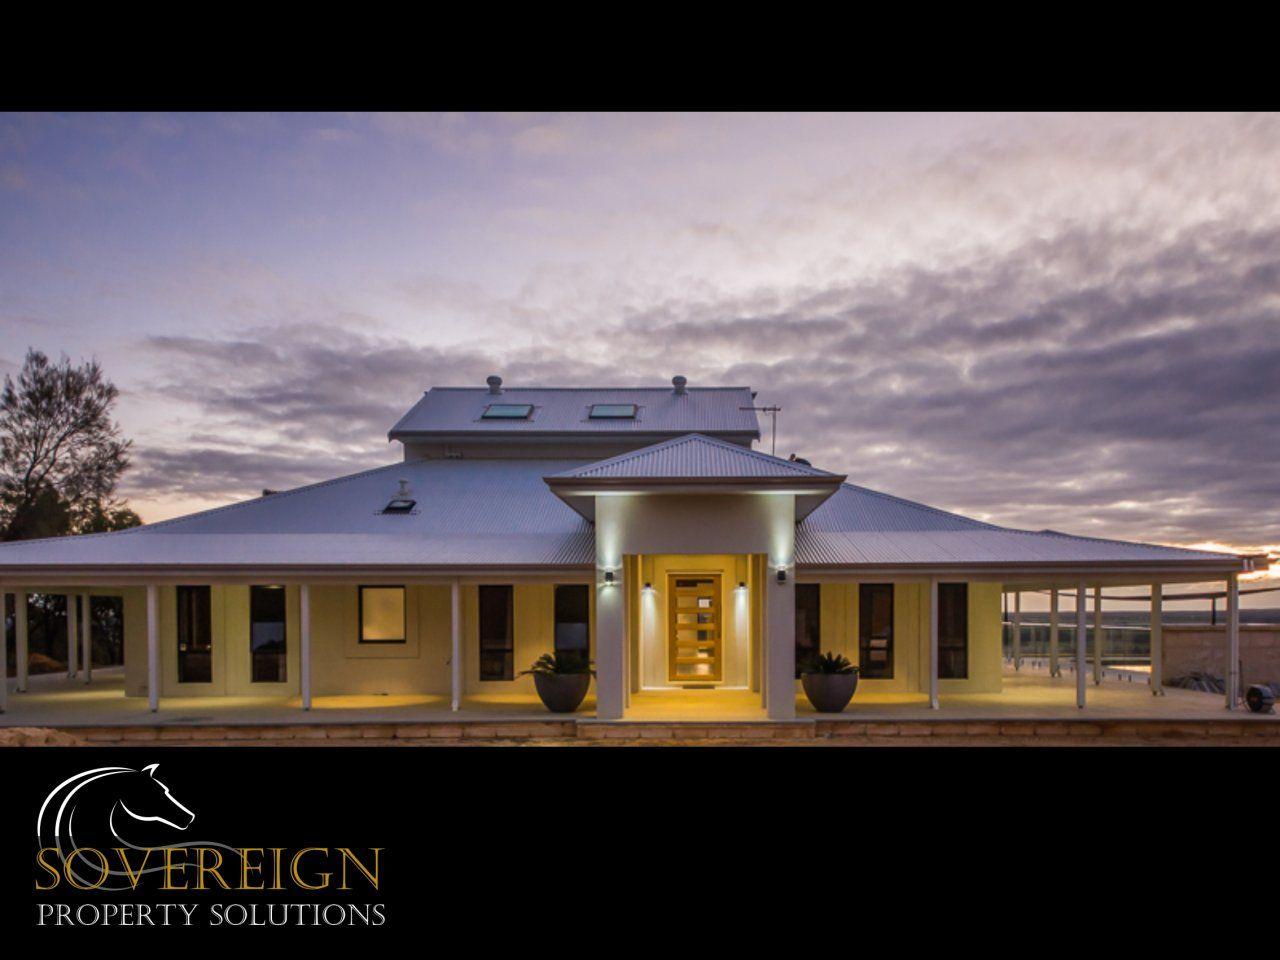 The white house on the hill See more:   #WesternAustralia #ForSale #RealEstate #LuxuryRealEstate #HorseProperty #Bullsbrook